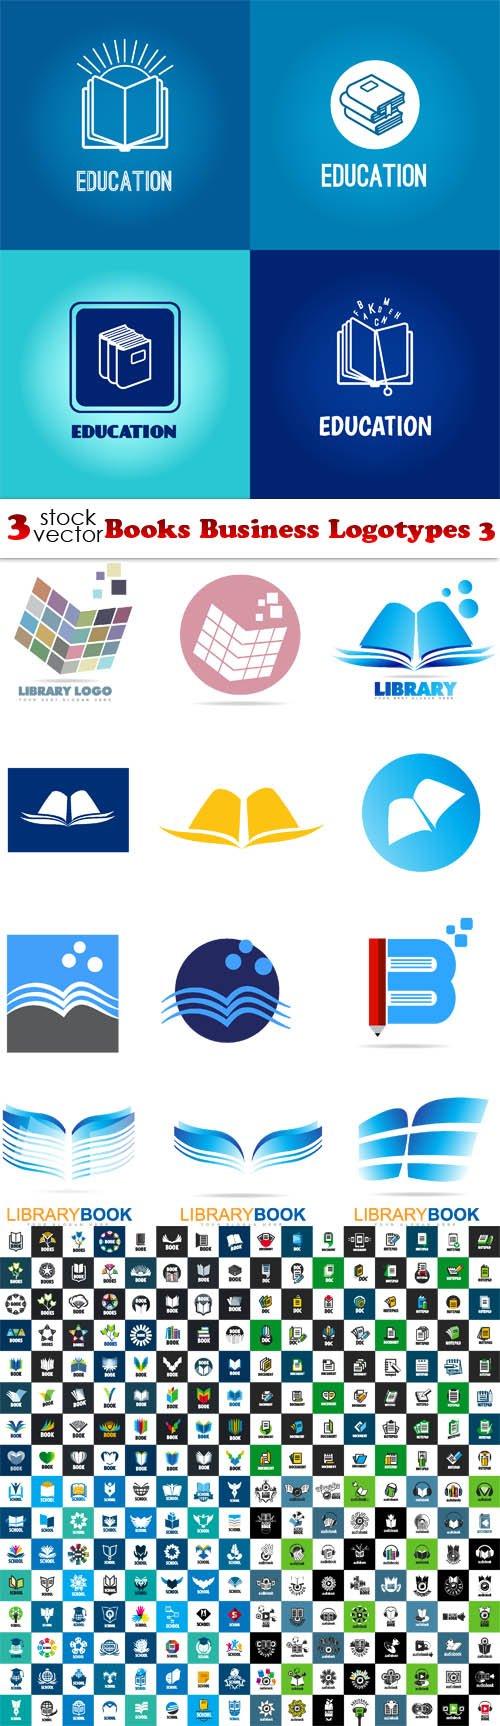 Vectors - Books Business Logotypes 3